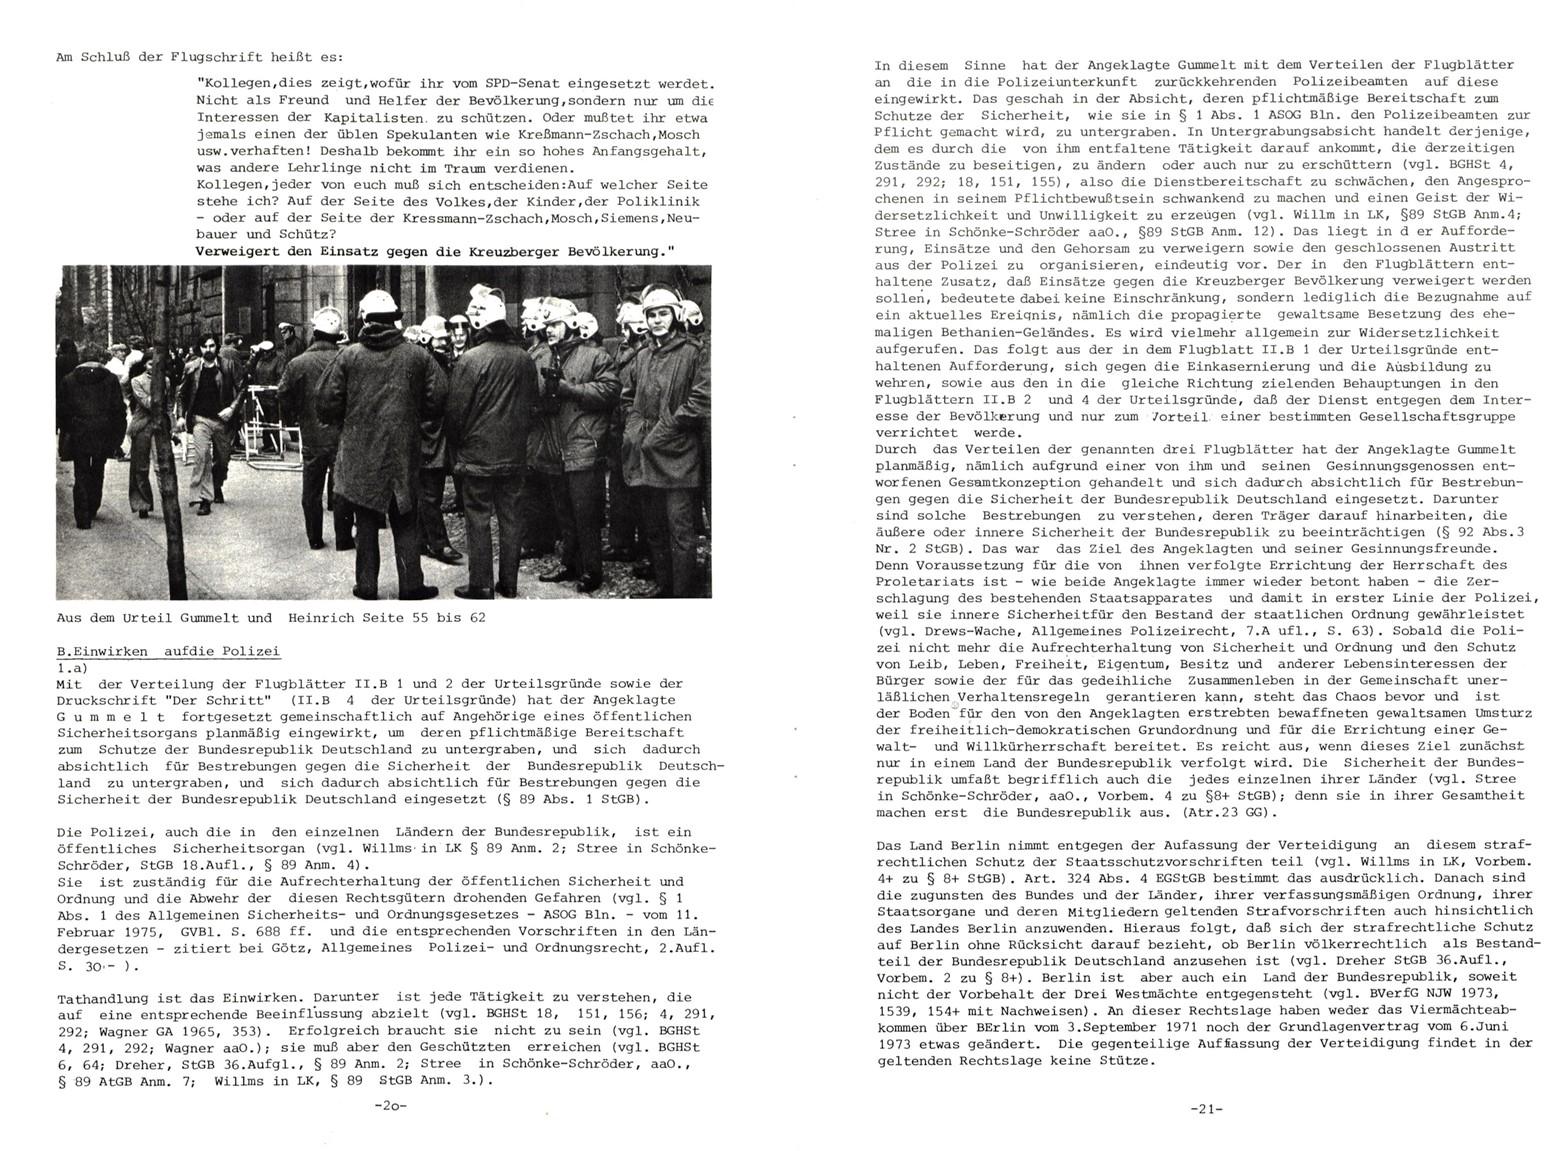 KPDAO_1976_Staatsschutzparagrafen_11